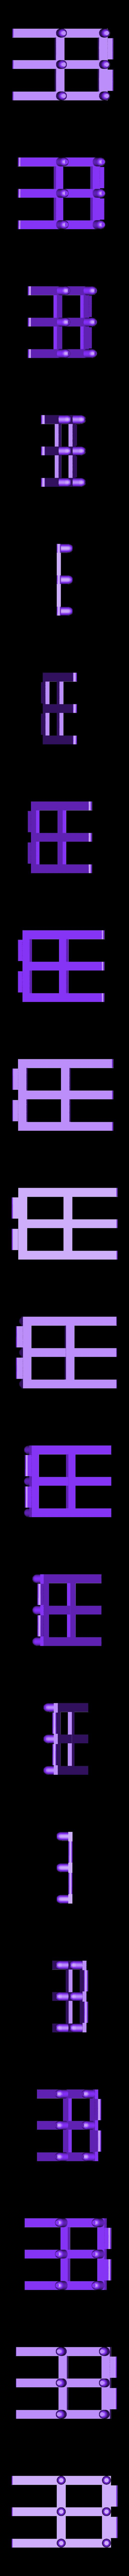 Romulan_harness_x23.stl Download free STL file Romulan Harness • 3D print template, poblocki1982